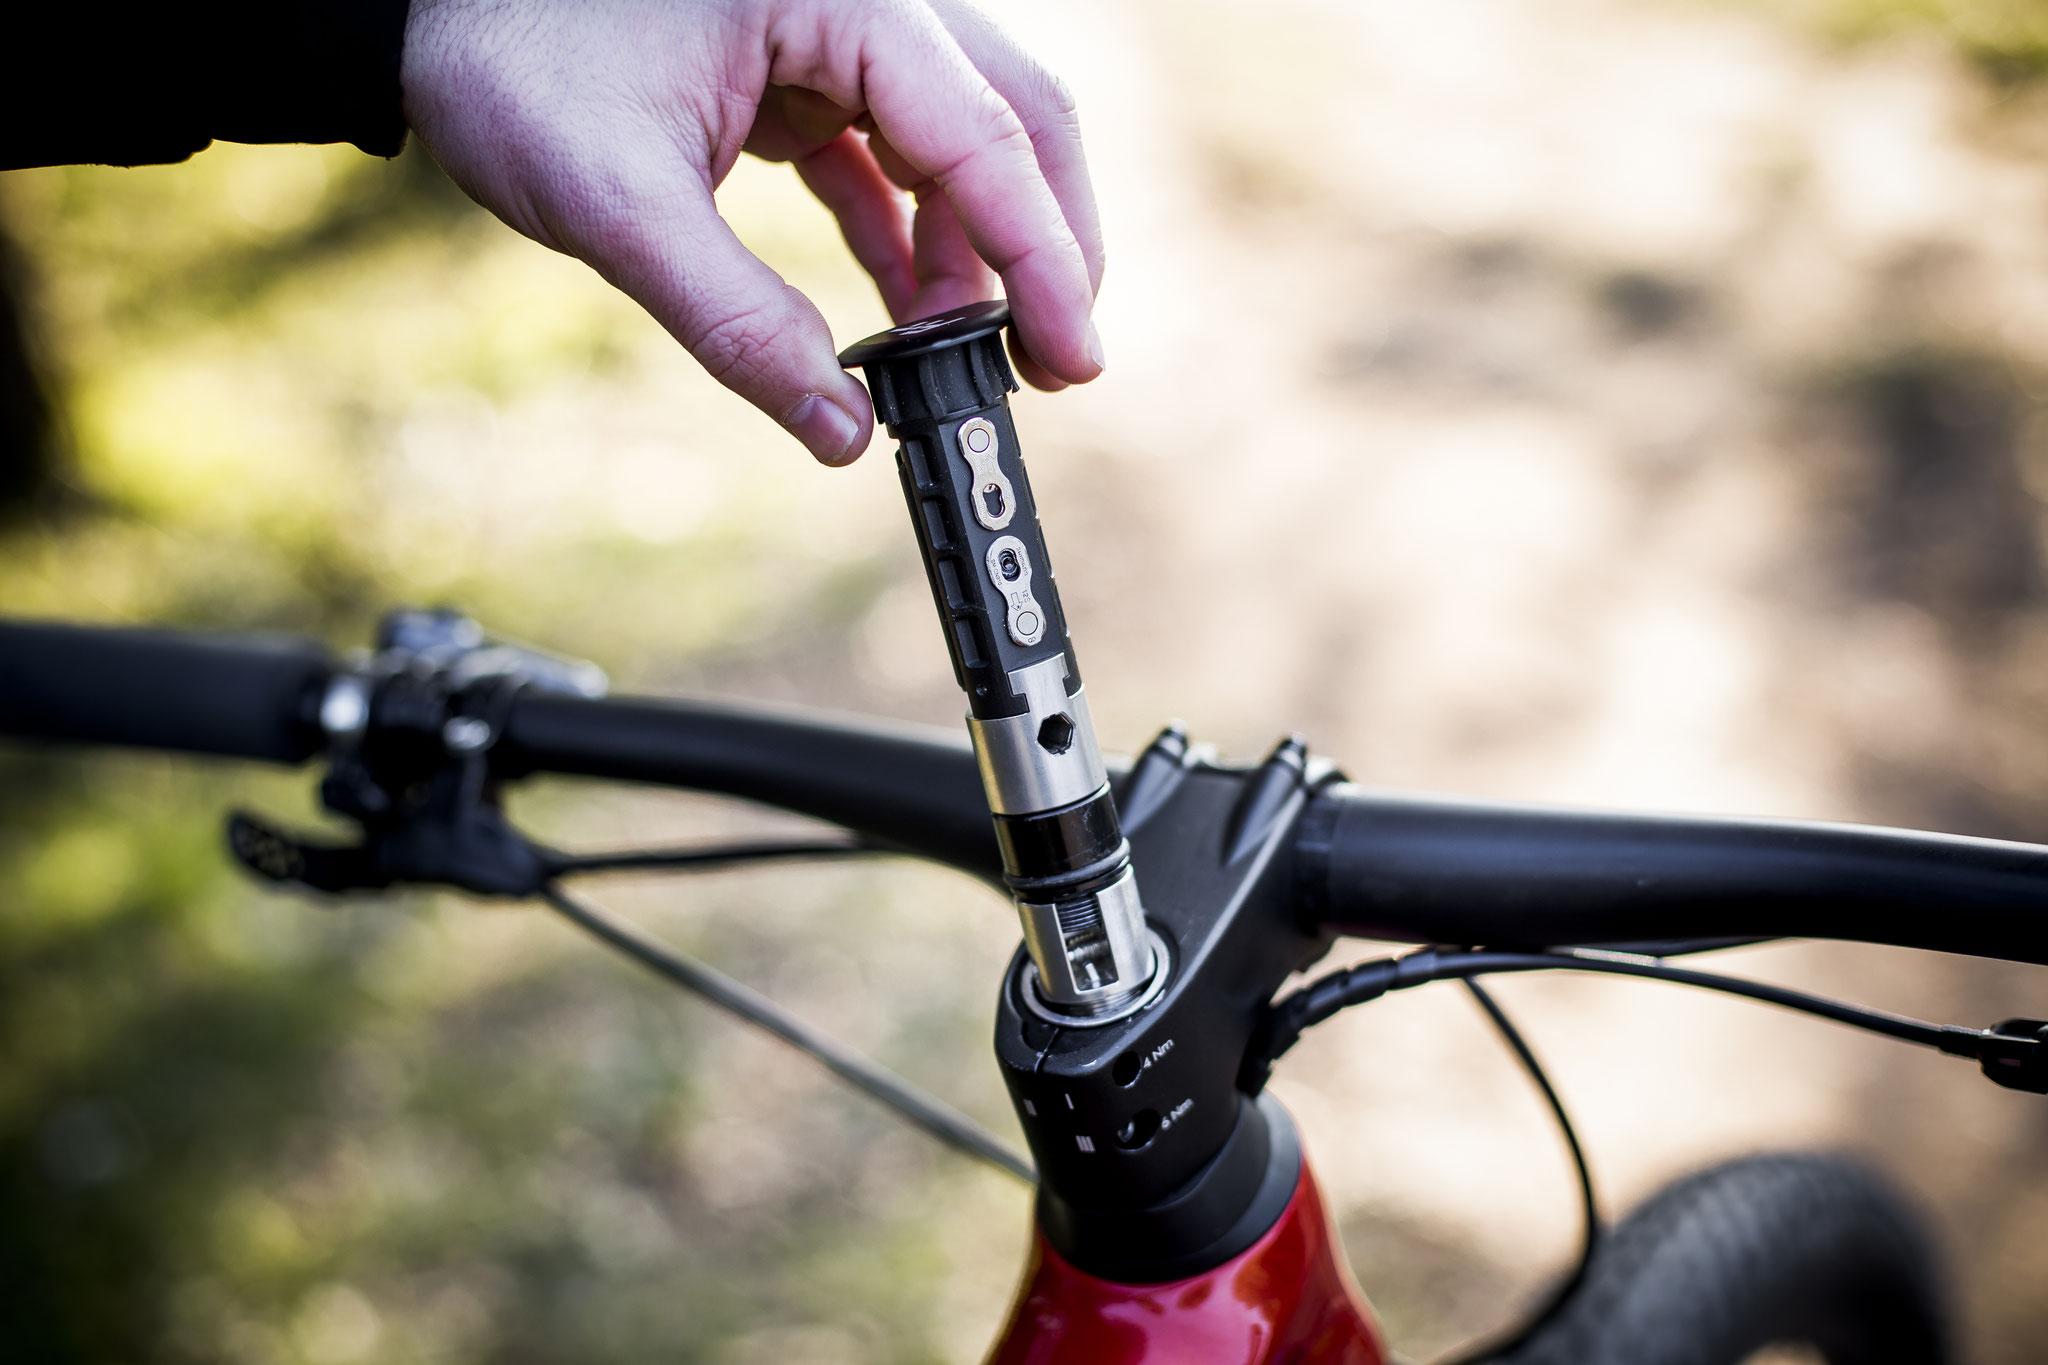 BH Bikes neu präsentiertes FIT-System (Fast Intervention Tool)